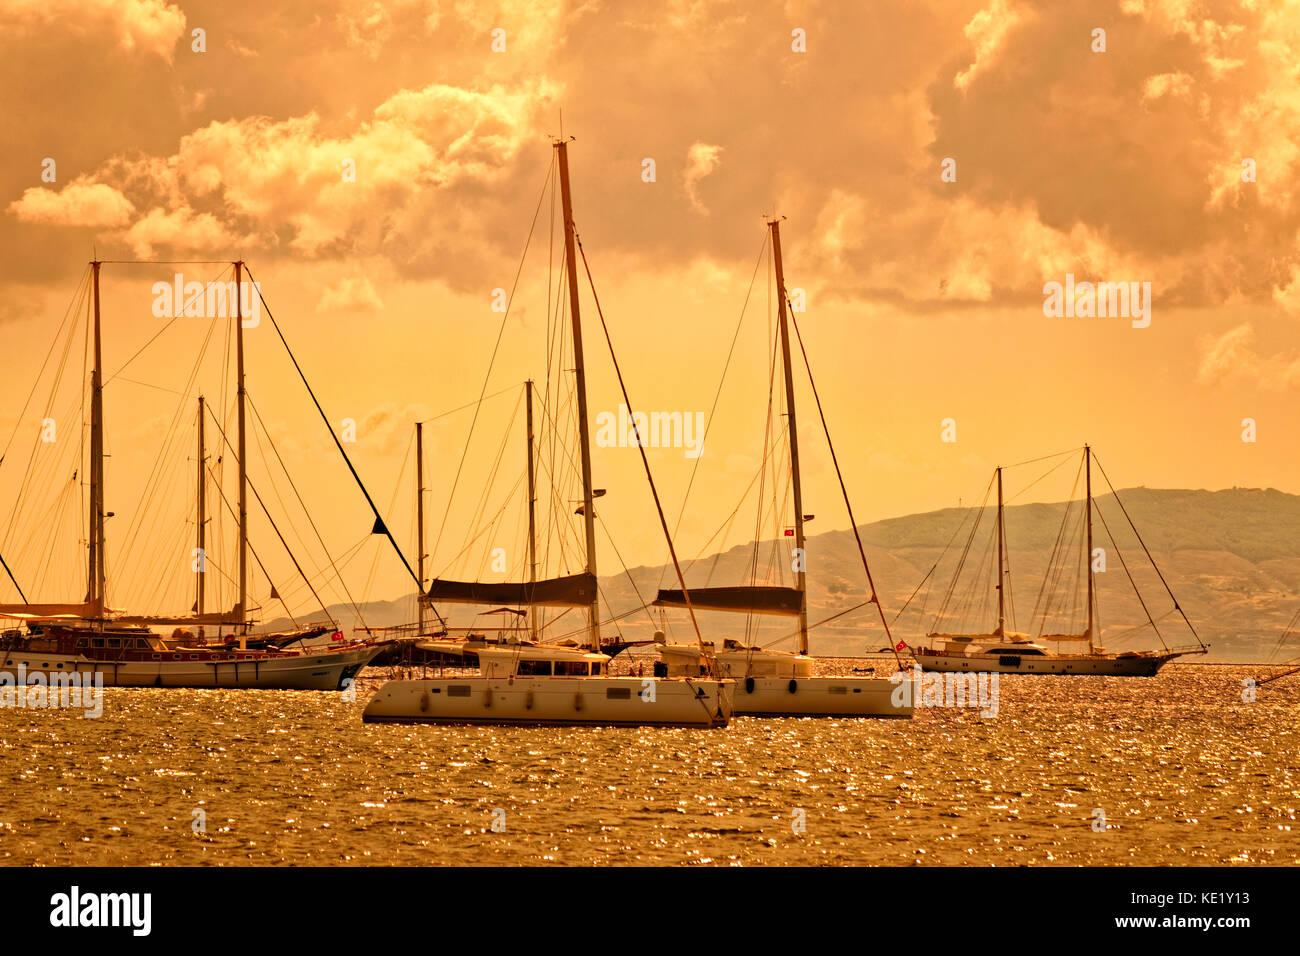 Catamarans and yachts at anchor, Bodrum, Turkey. - Stock Image